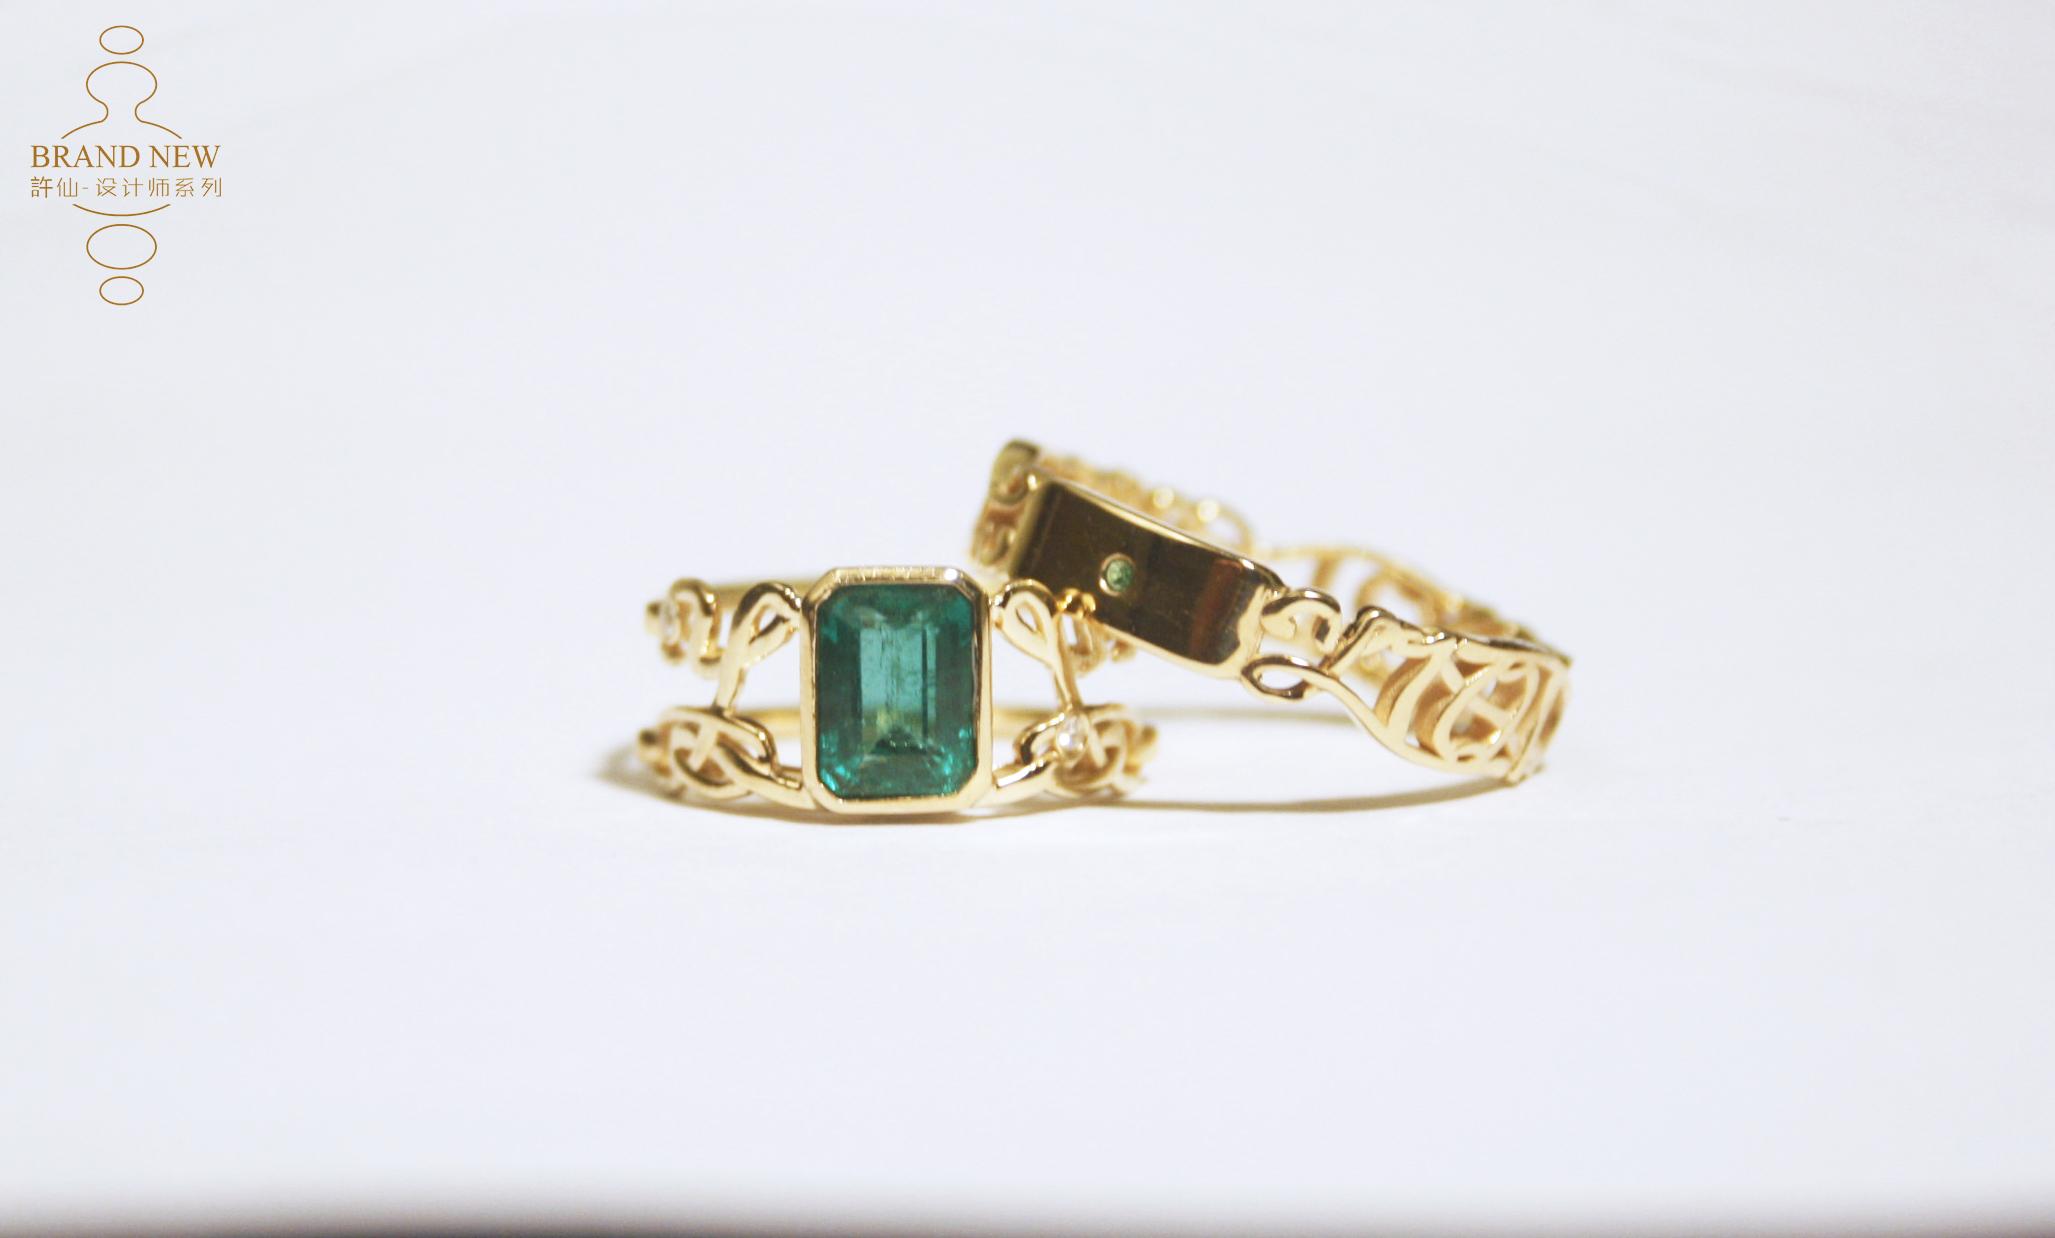 �S仙|字母数字纪念日 祖母绿 18k黄金对戒 情侣求婚指环私人订制